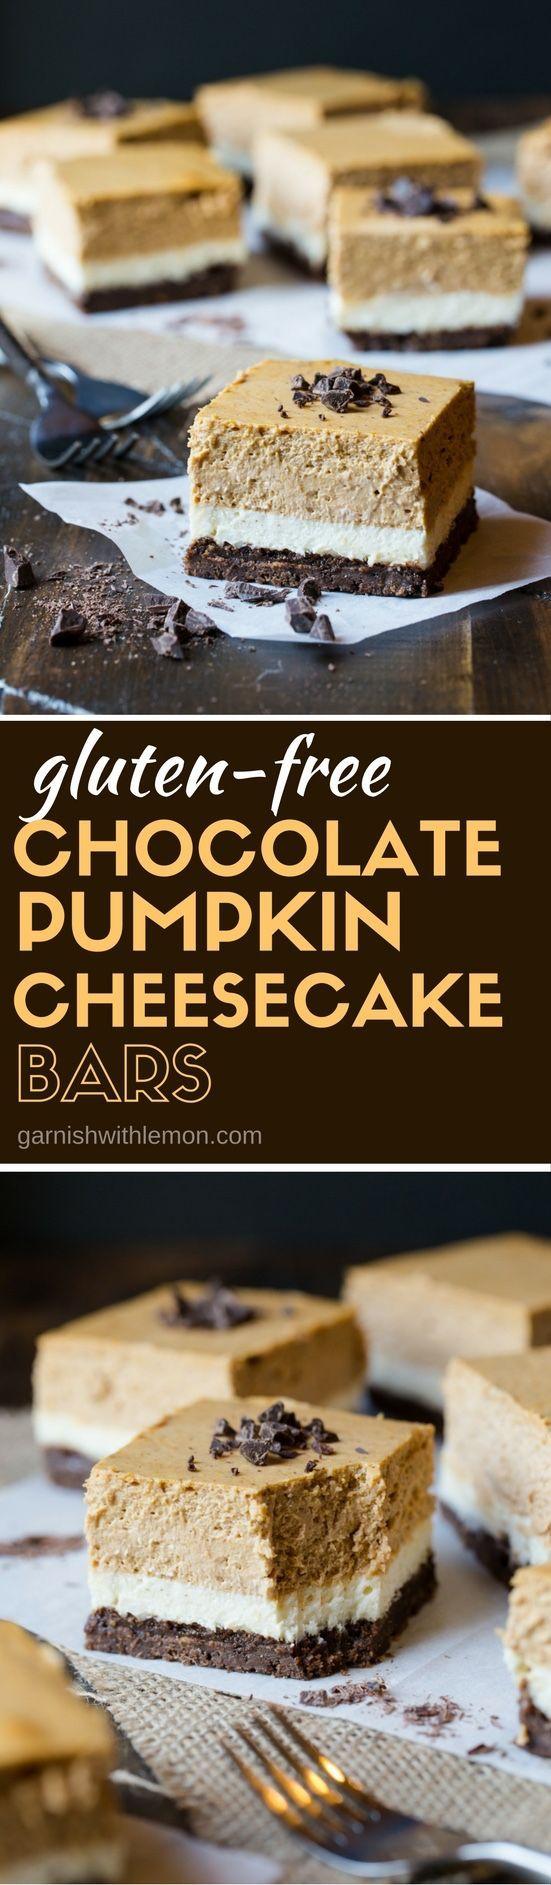 cool Gluten-Free Chocolate Pumpkin Cheesecake Bars